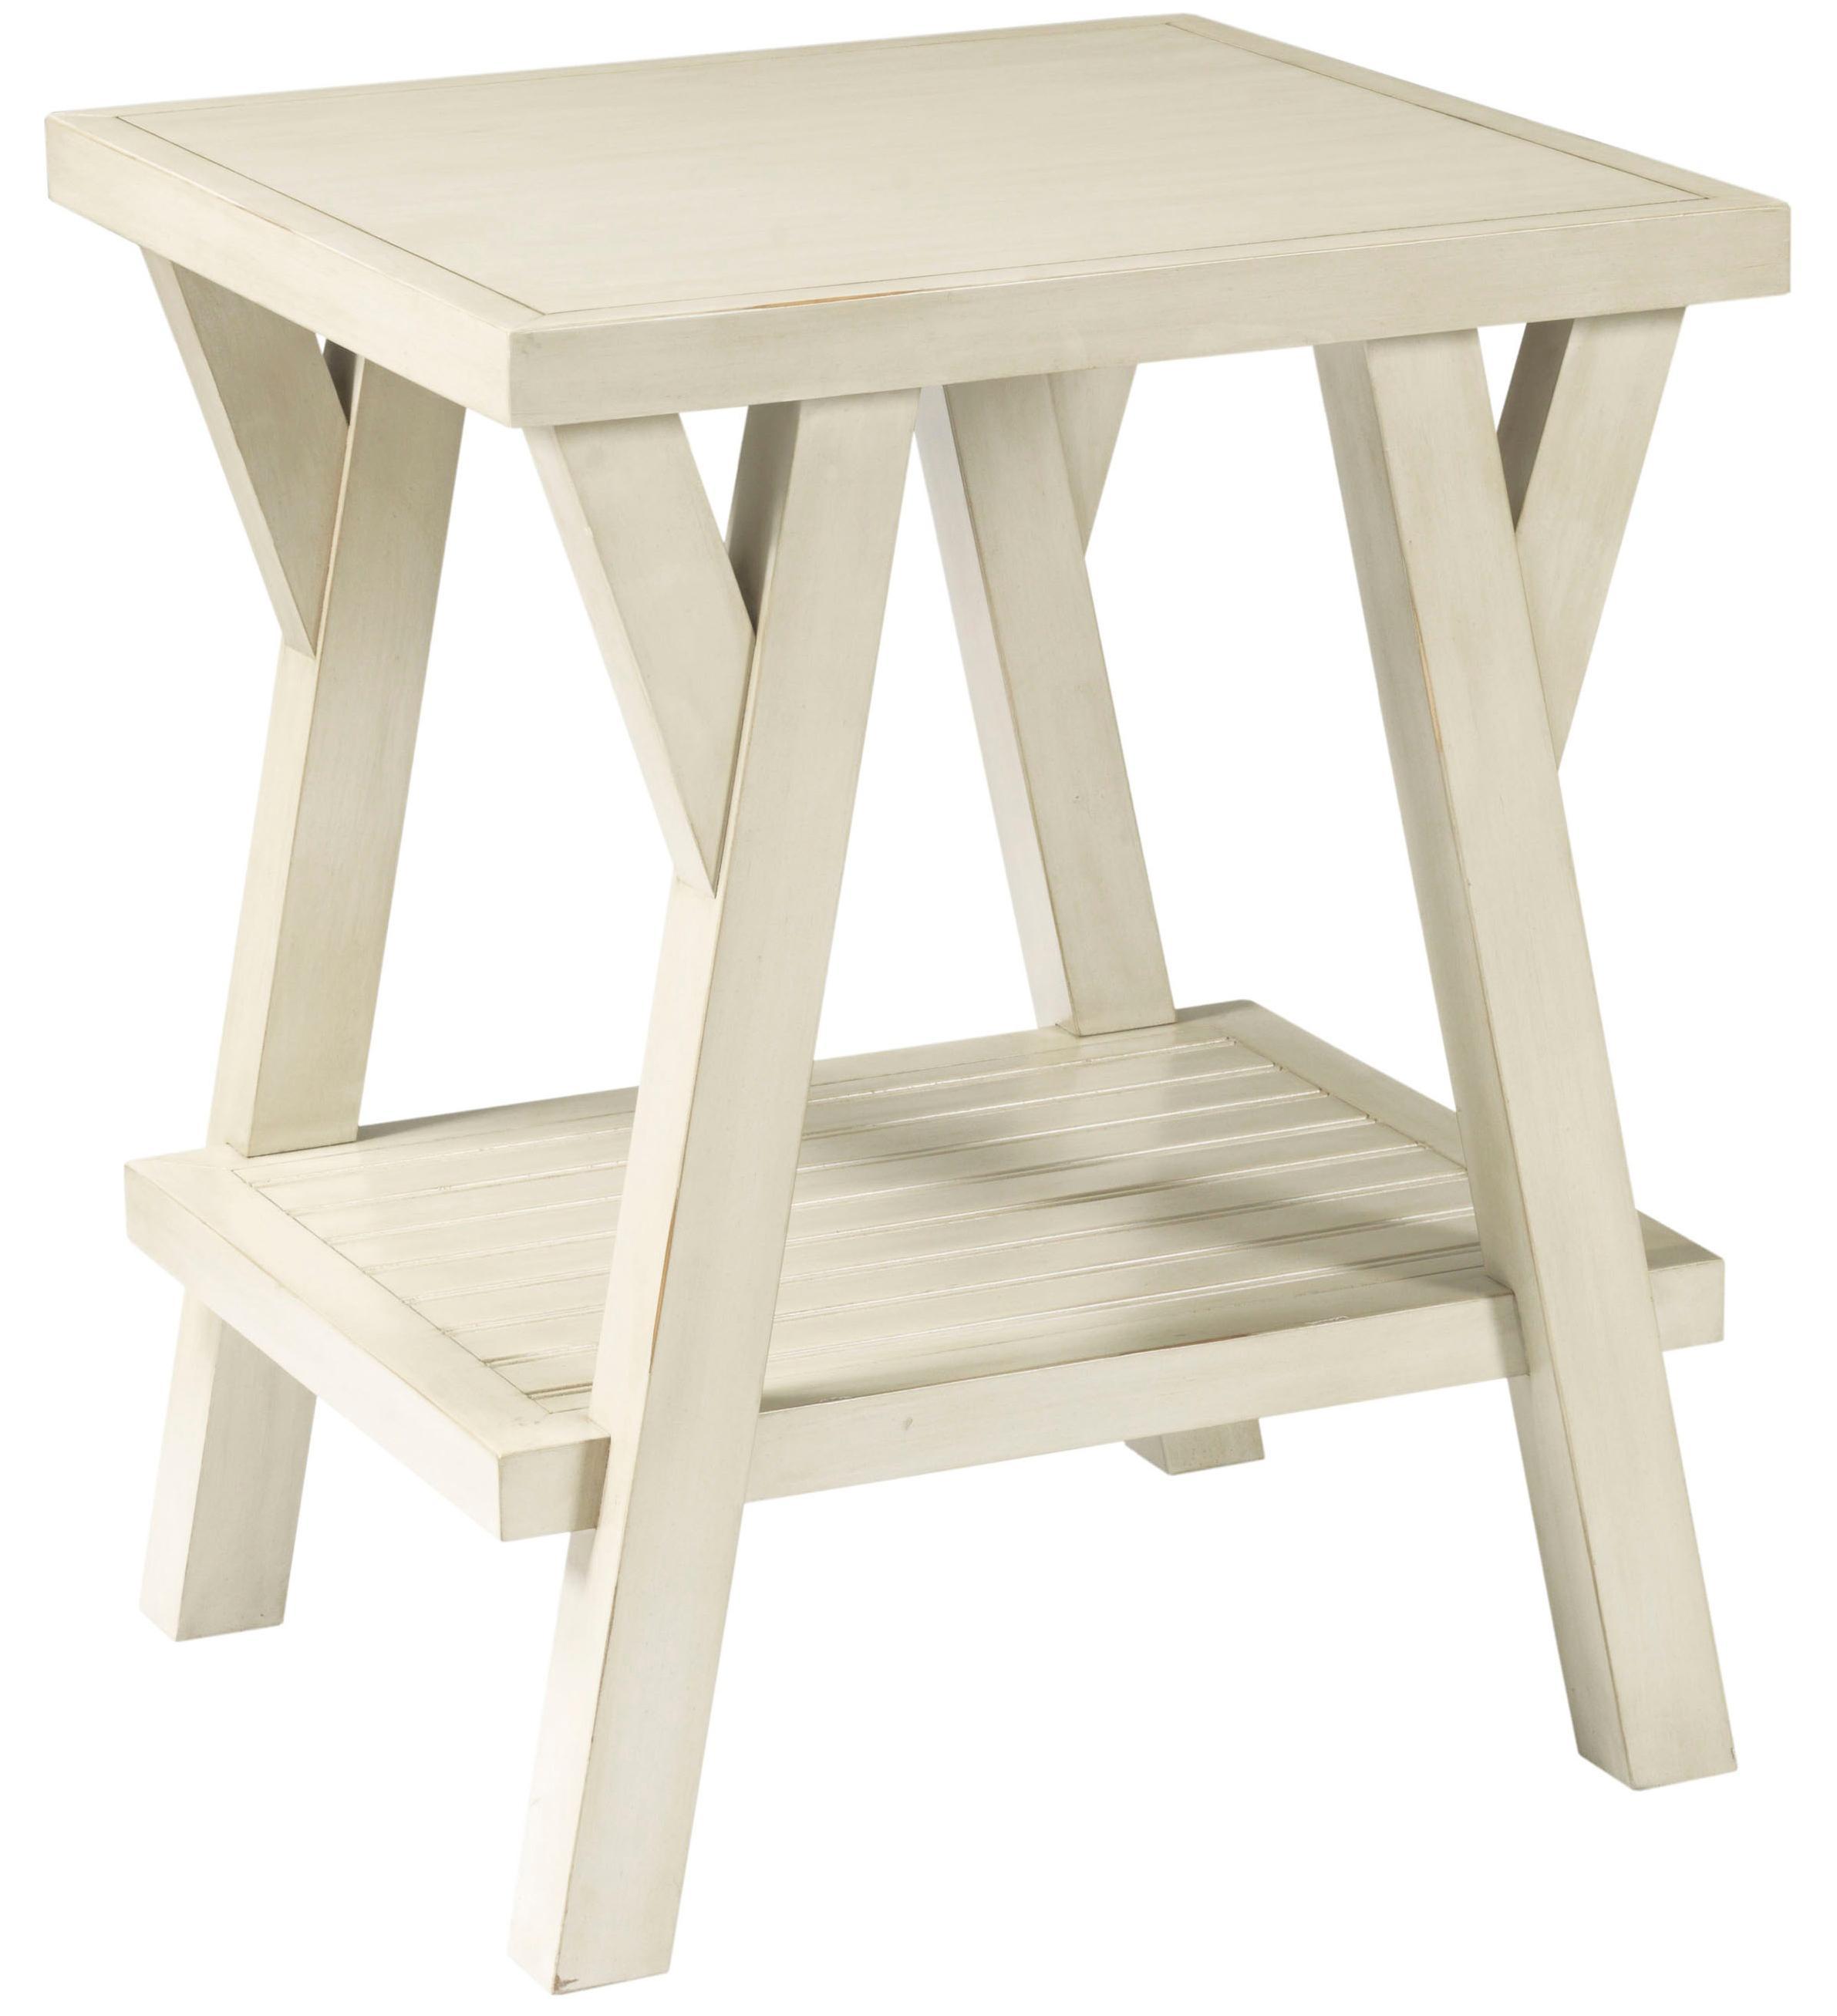 Broyhill Furniture New Vintage Splay Leg End Table - Item Number: 4807-000